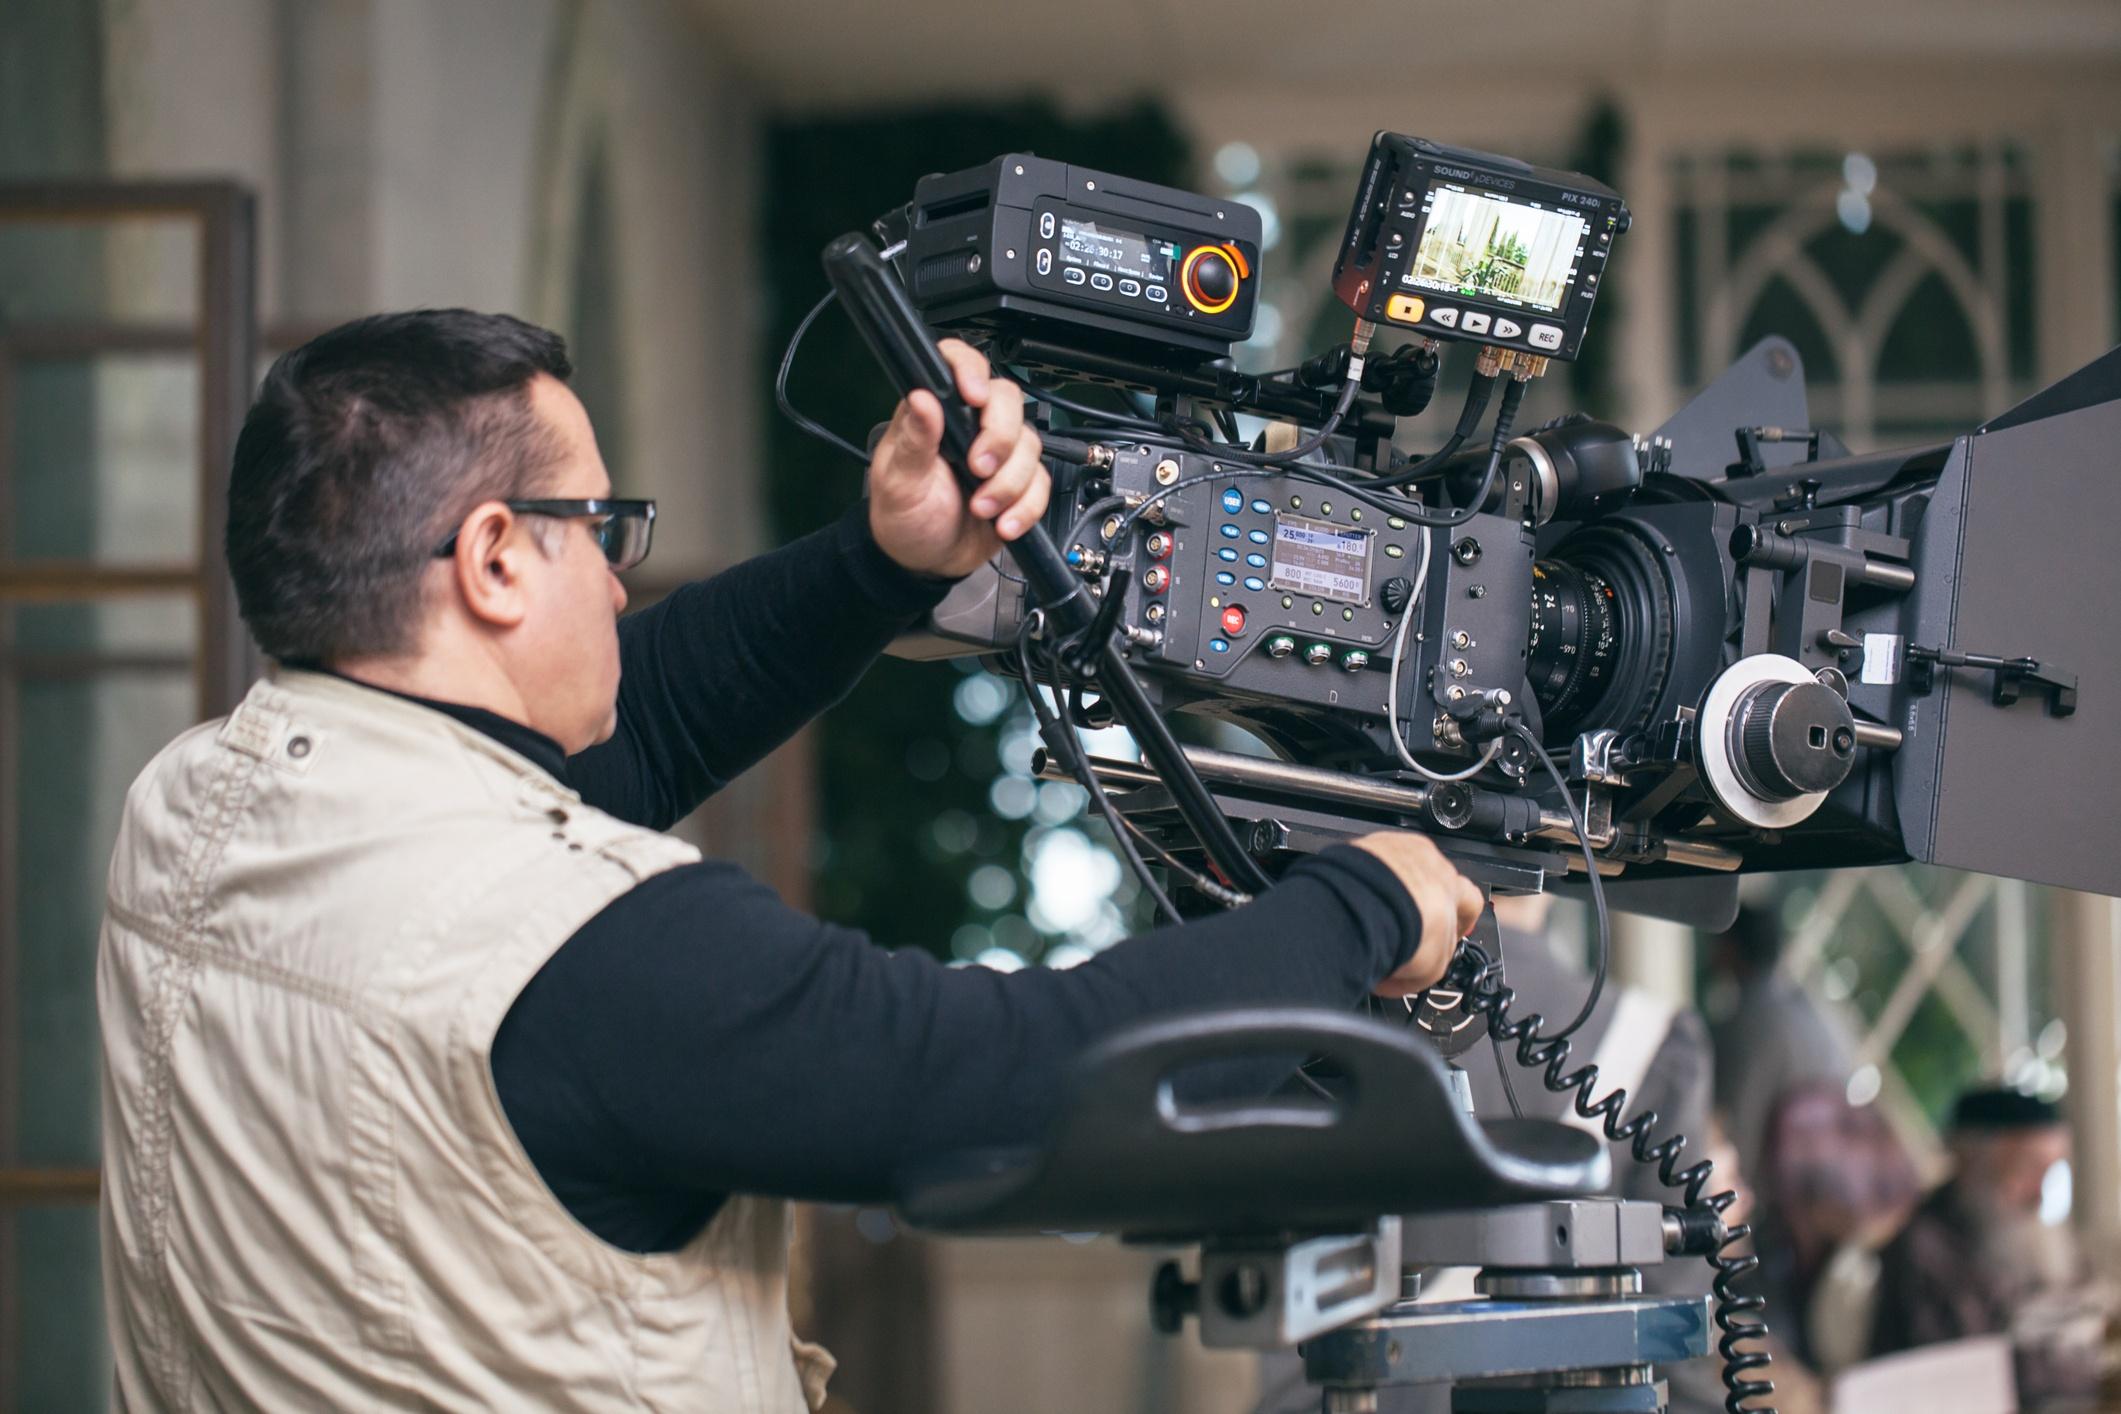 Early Adopters Make Video Marketing Companies Vital